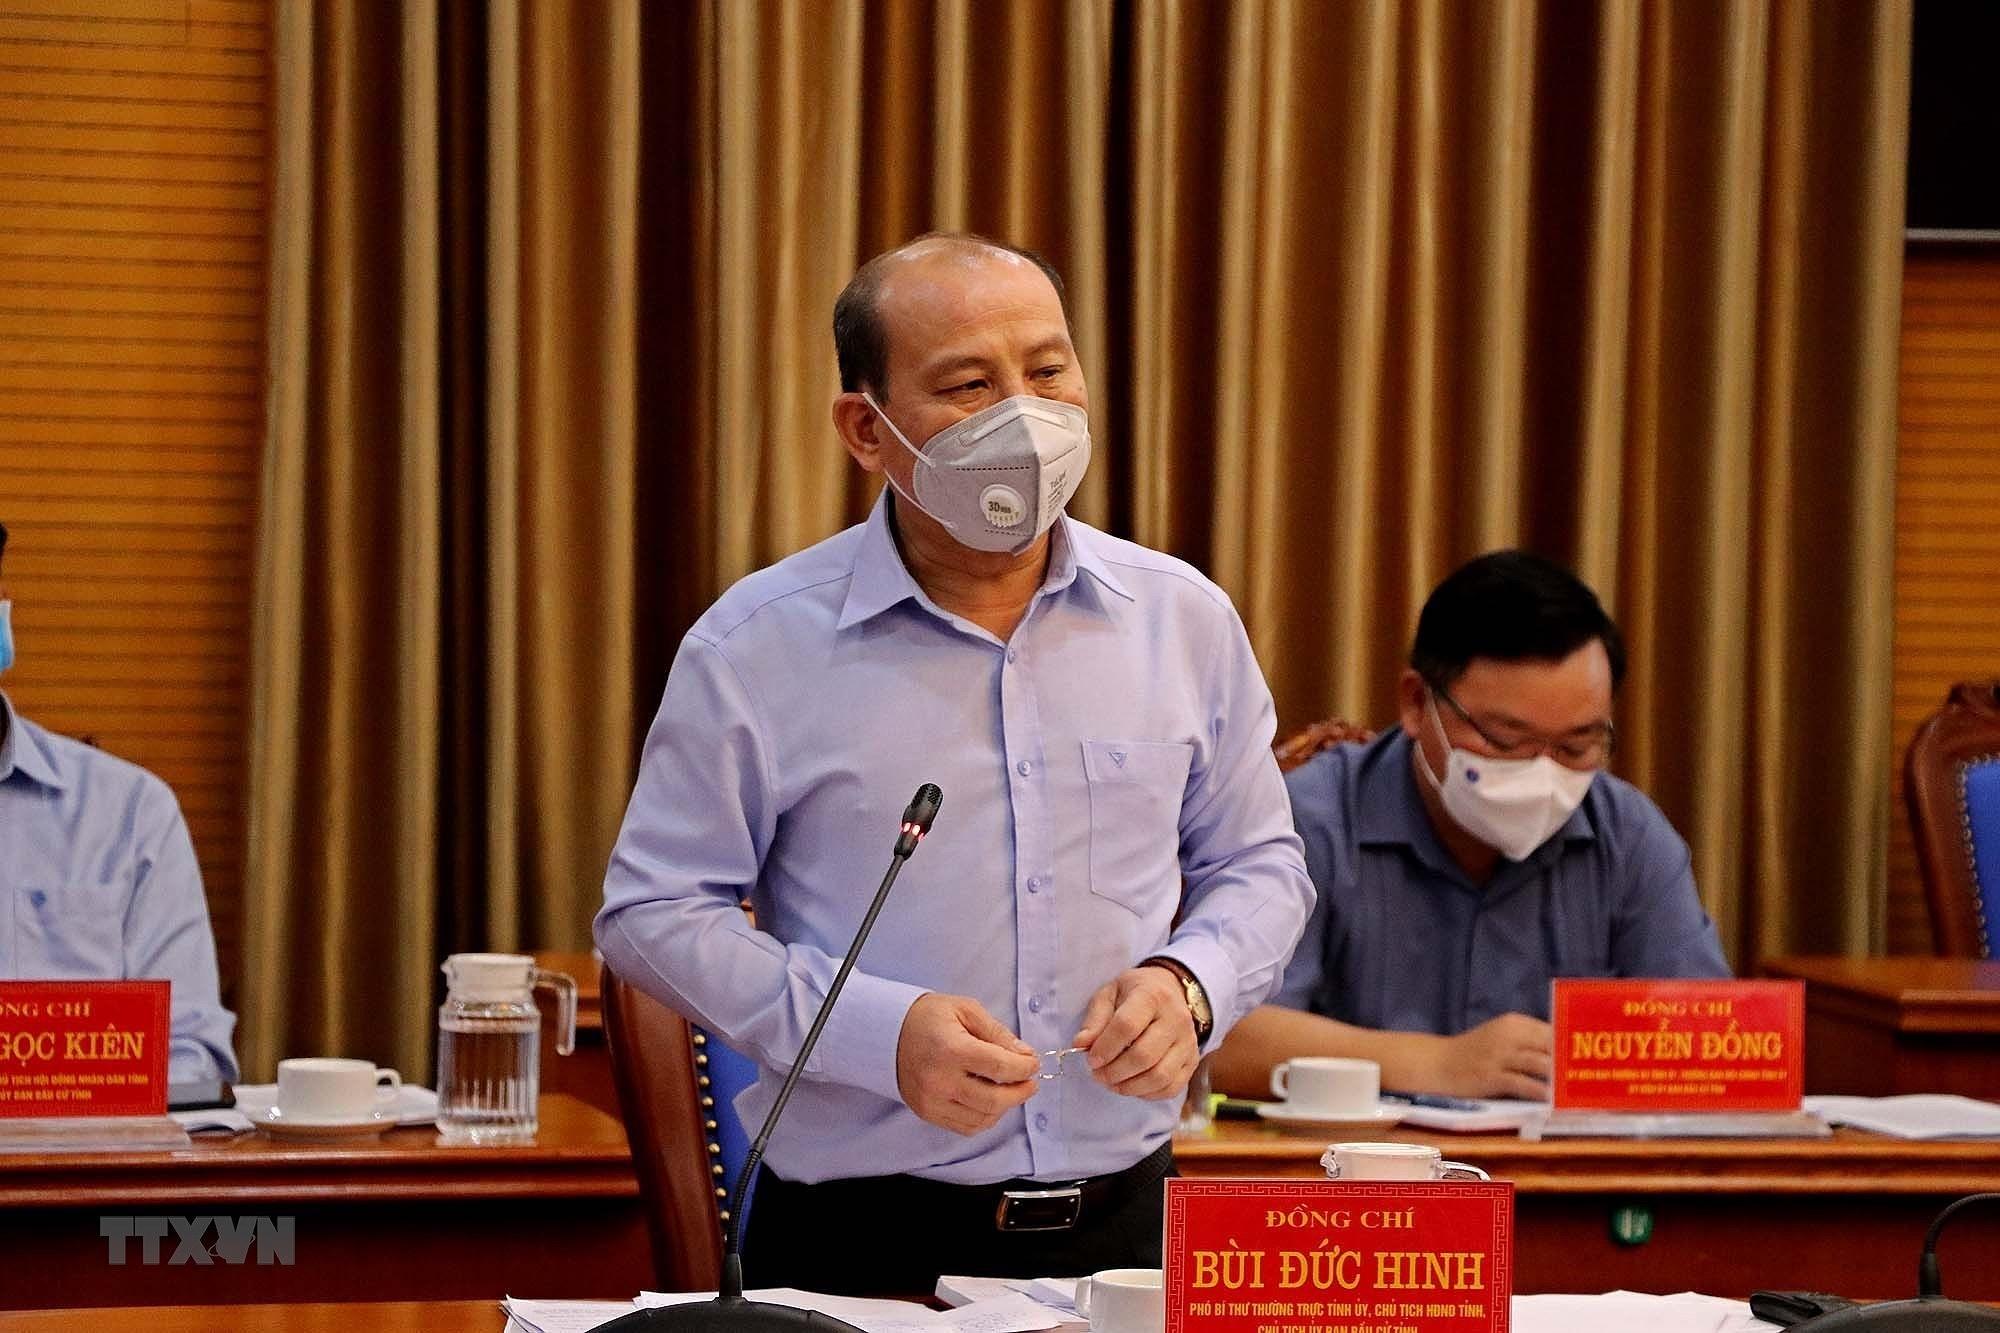 Hoa Binh: Cong tac bau cu Quoc hoi va HDND dam bao dung tien do hinh anh 1